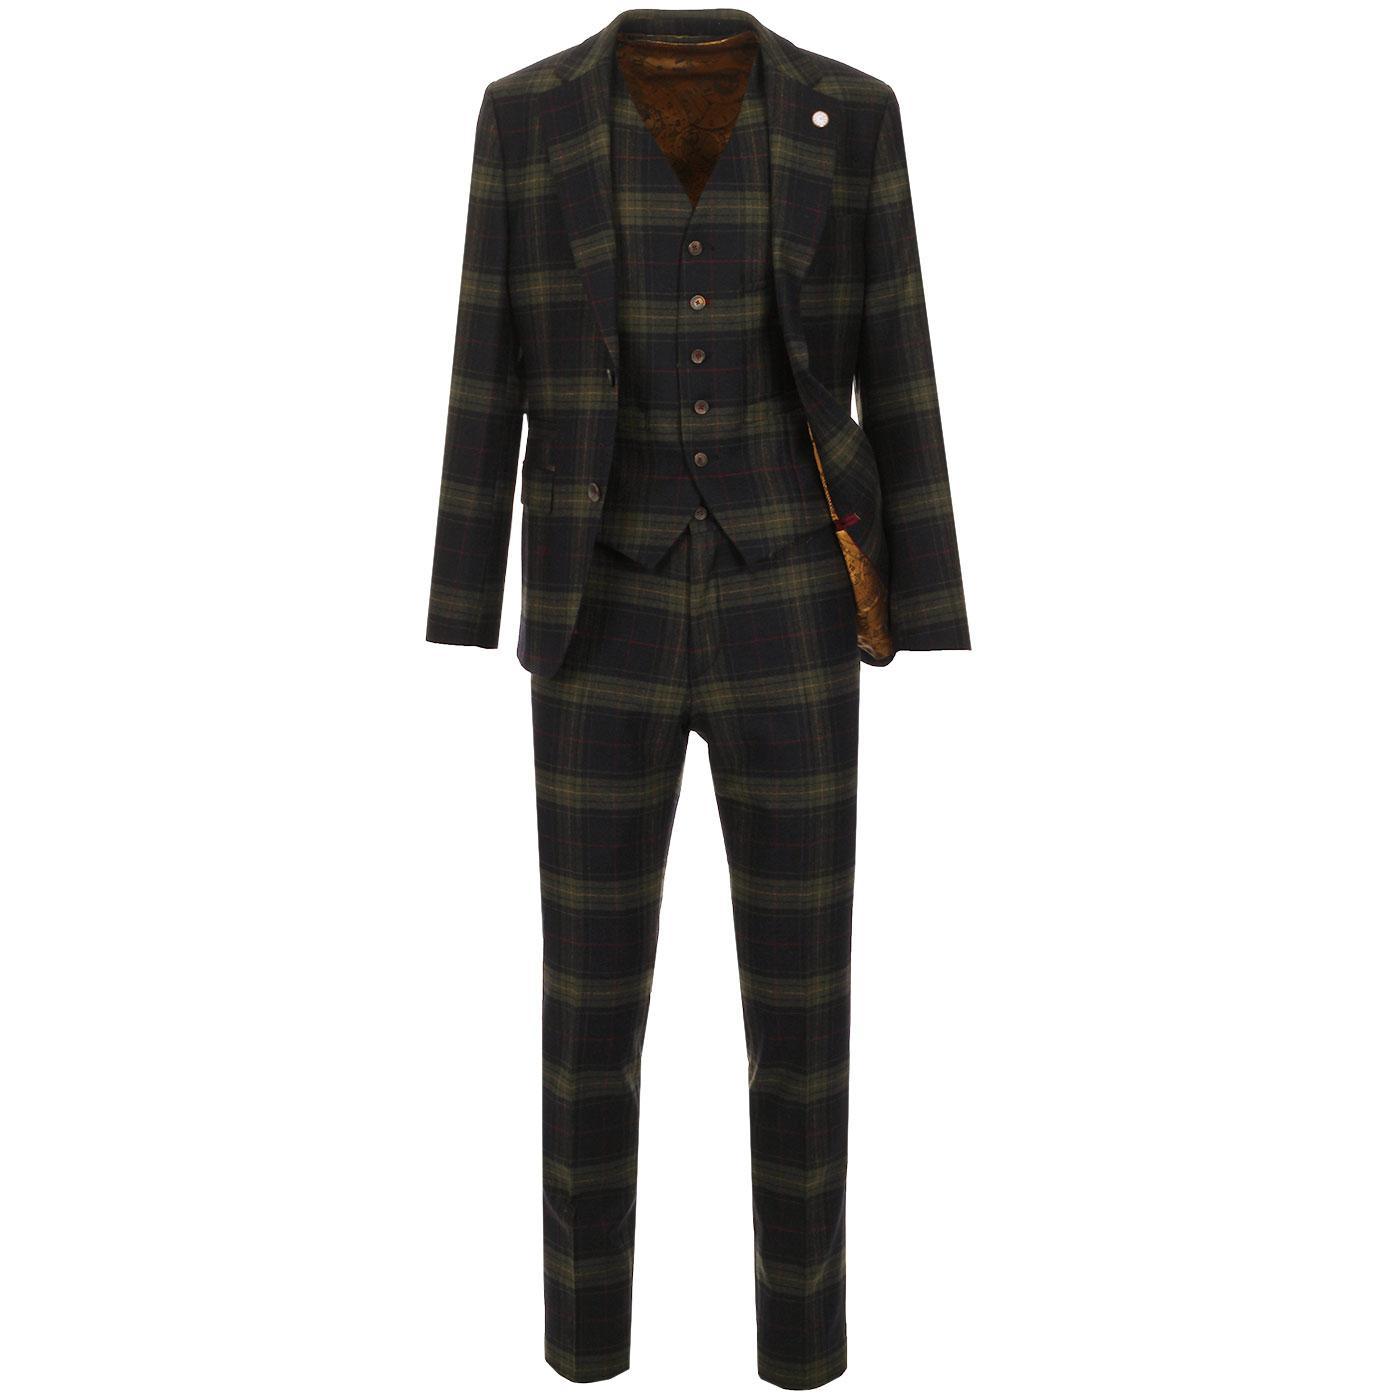 GIBSON LONDON Towergate Retro Mod 70s Tartan Suit